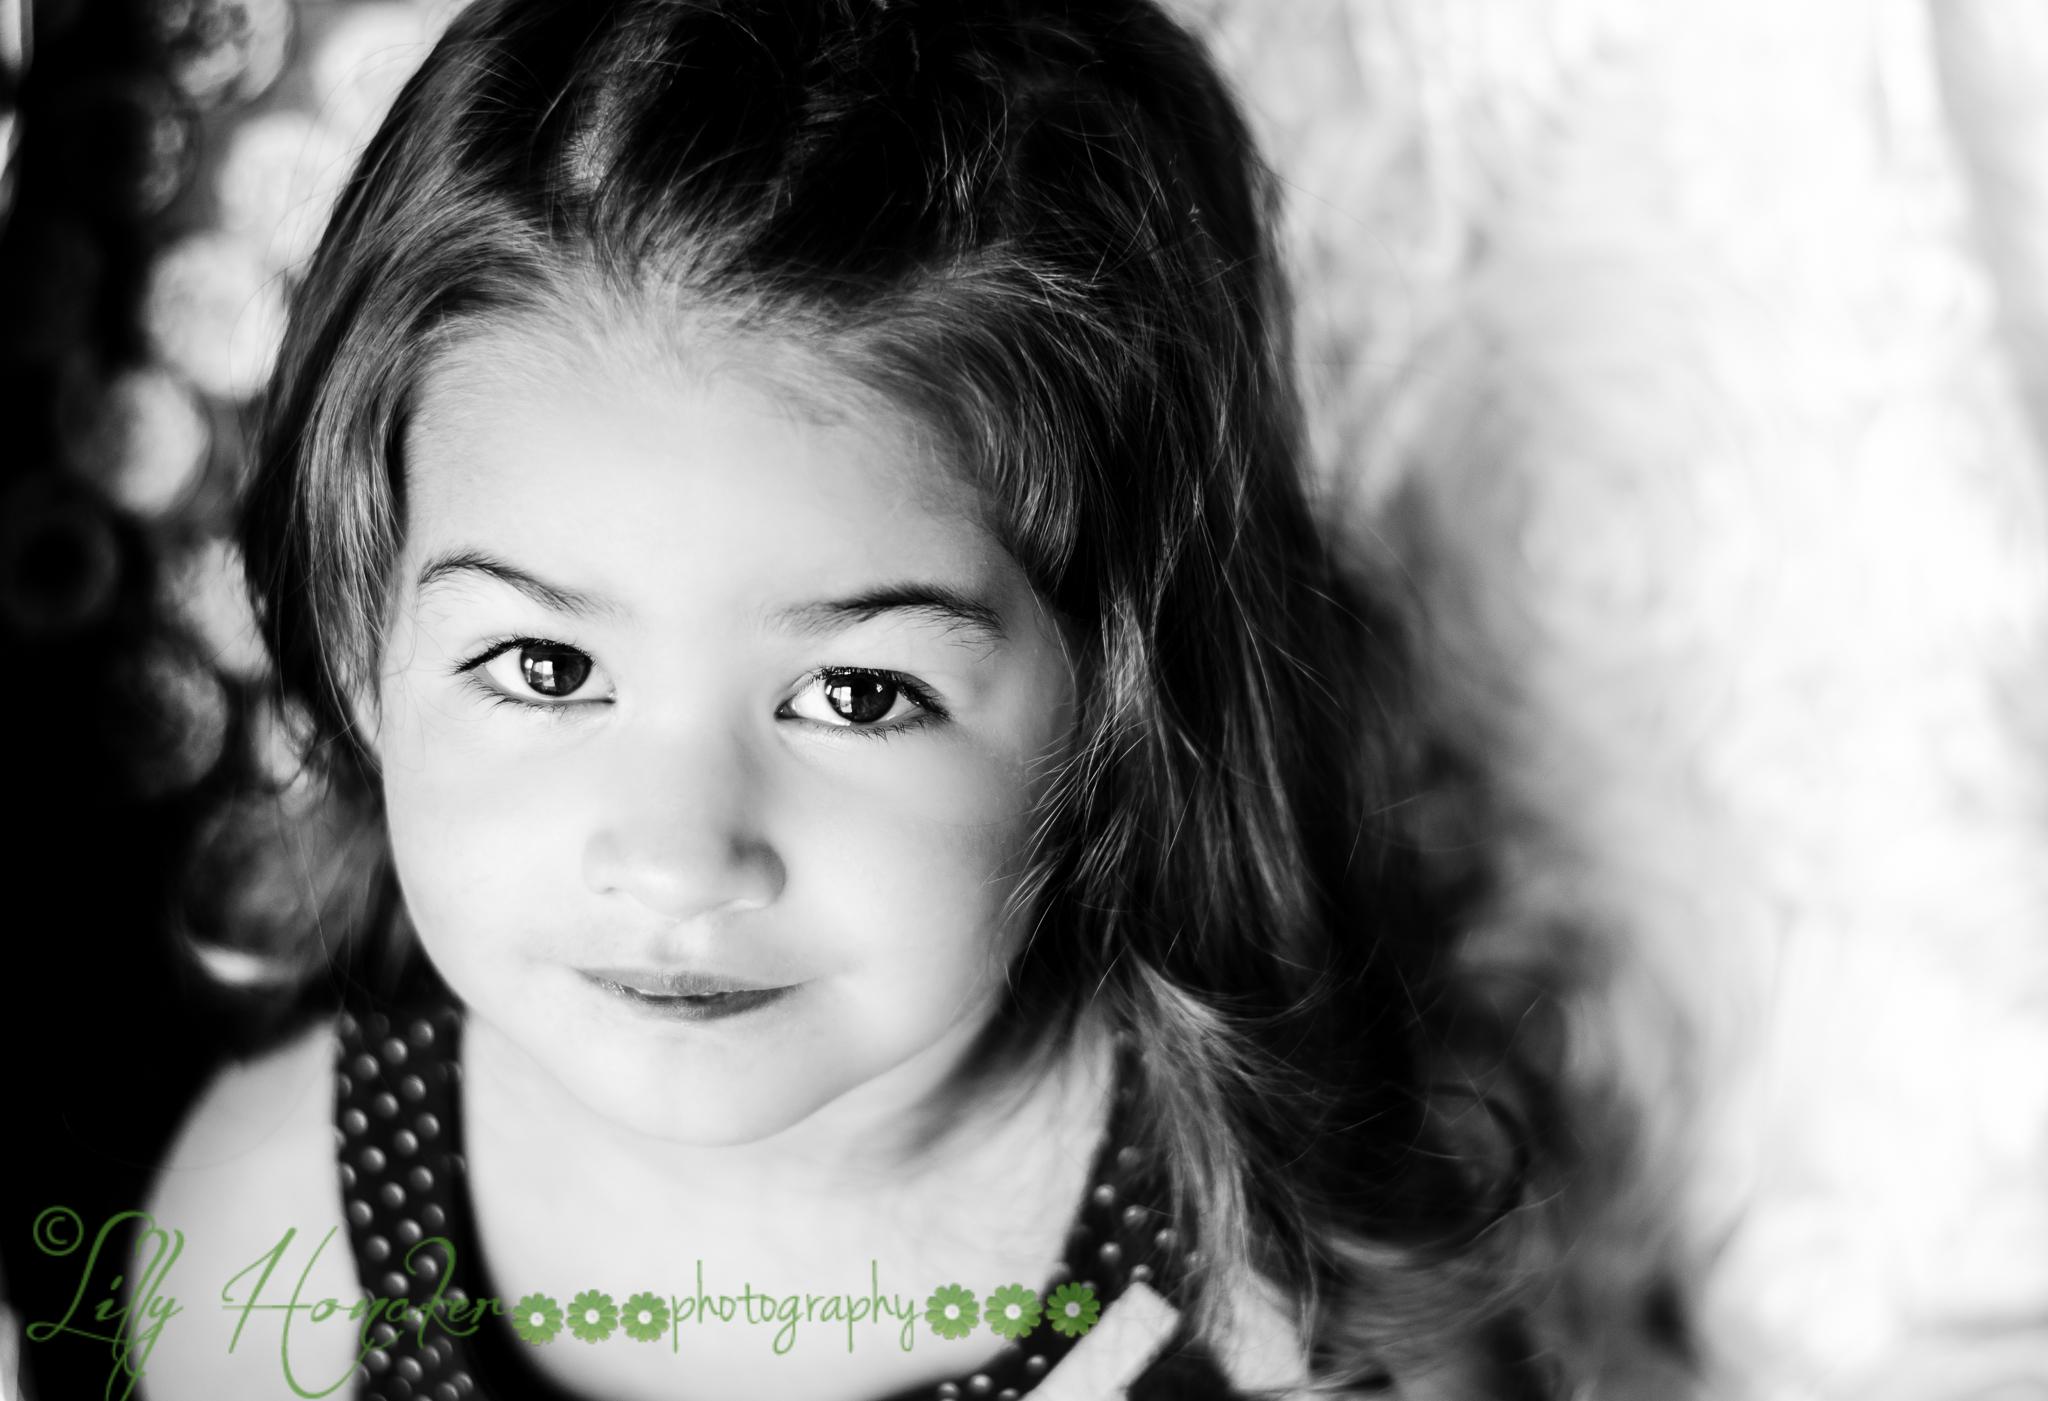 DSC_0993-2 Beautiful Bella in Black and White